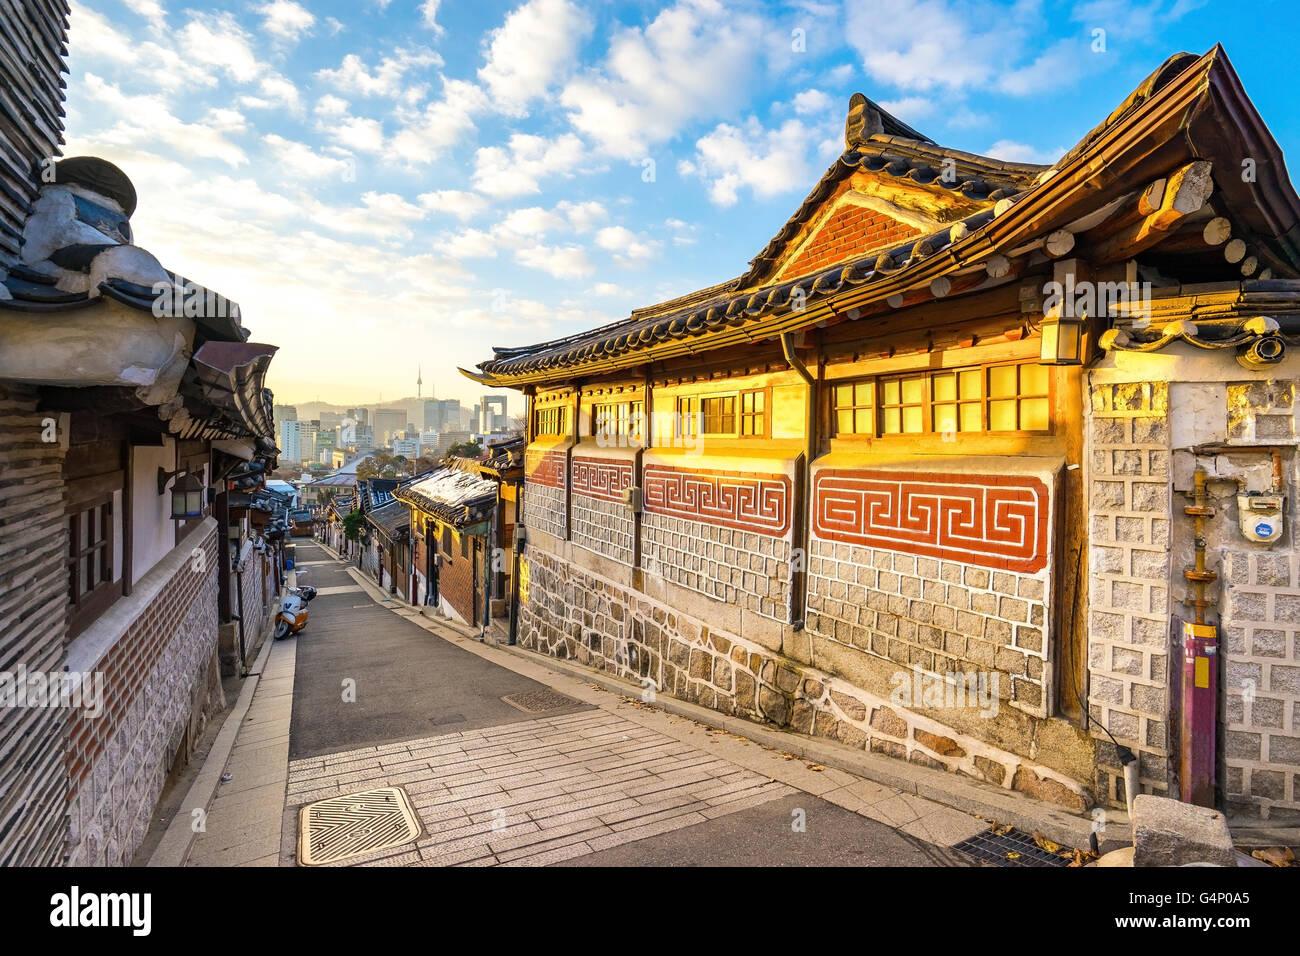 La antigua aldea Bukchon en Seúl, Corea del Sur. Imagen De Stock